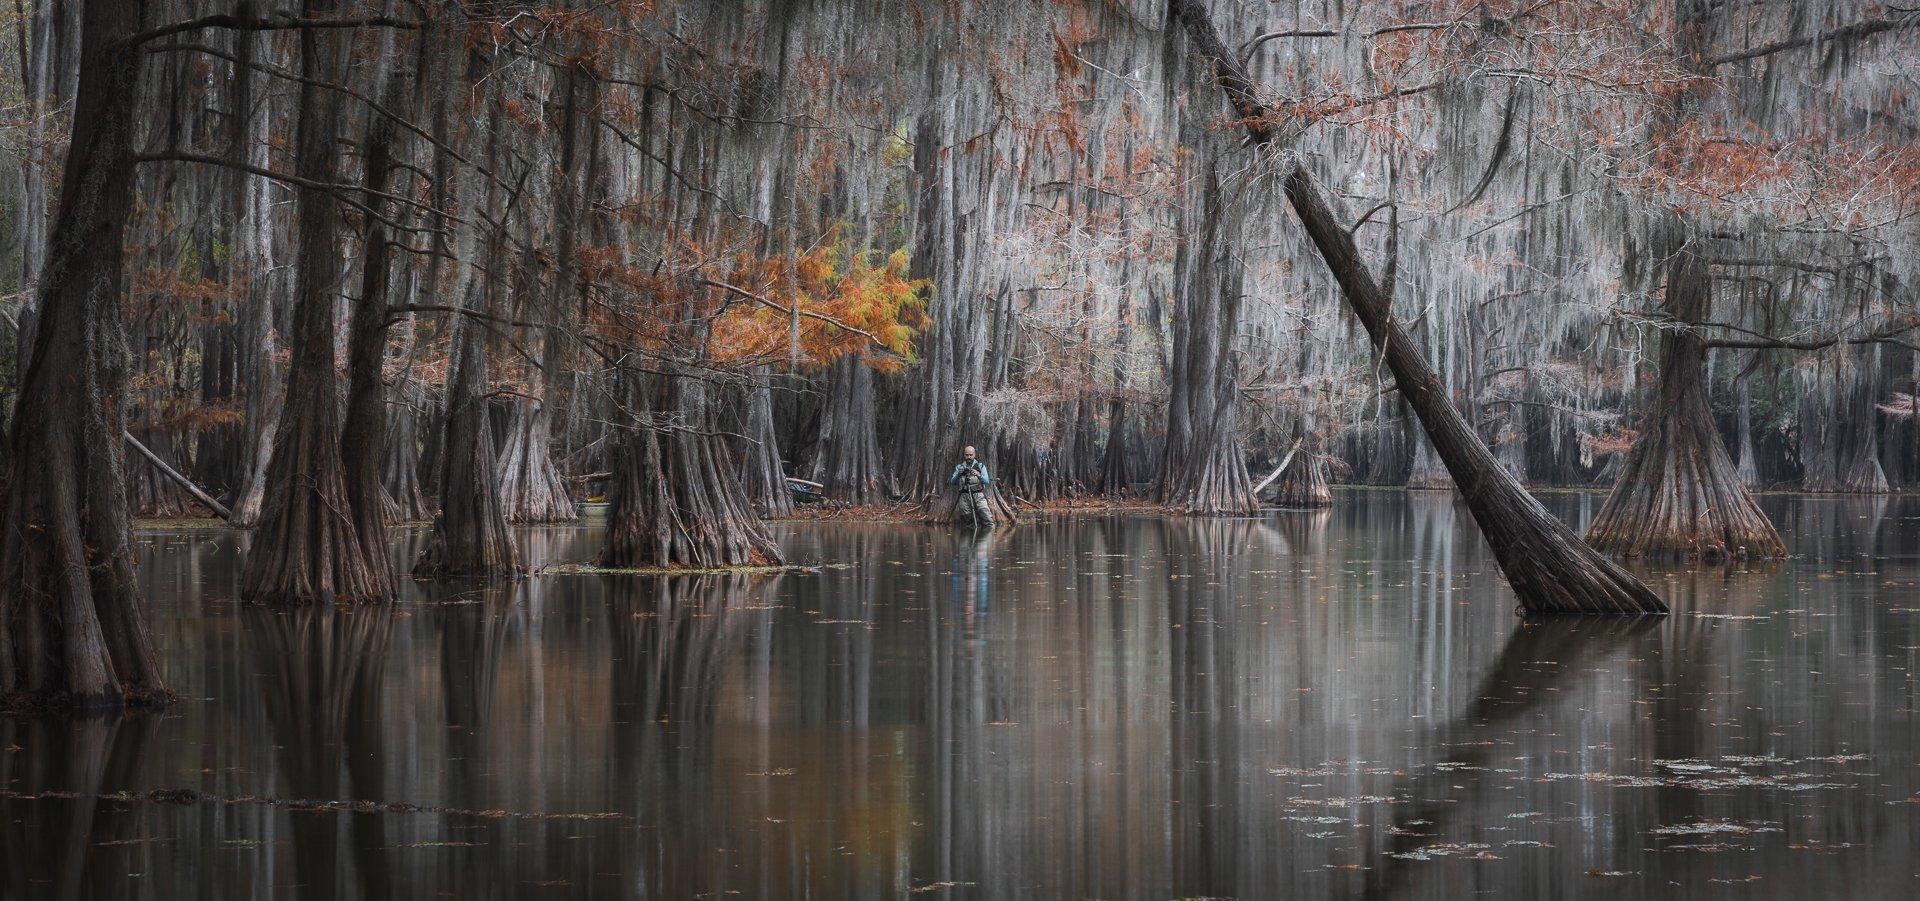 кипарисы, осень, болото, америка, Marina Malikova